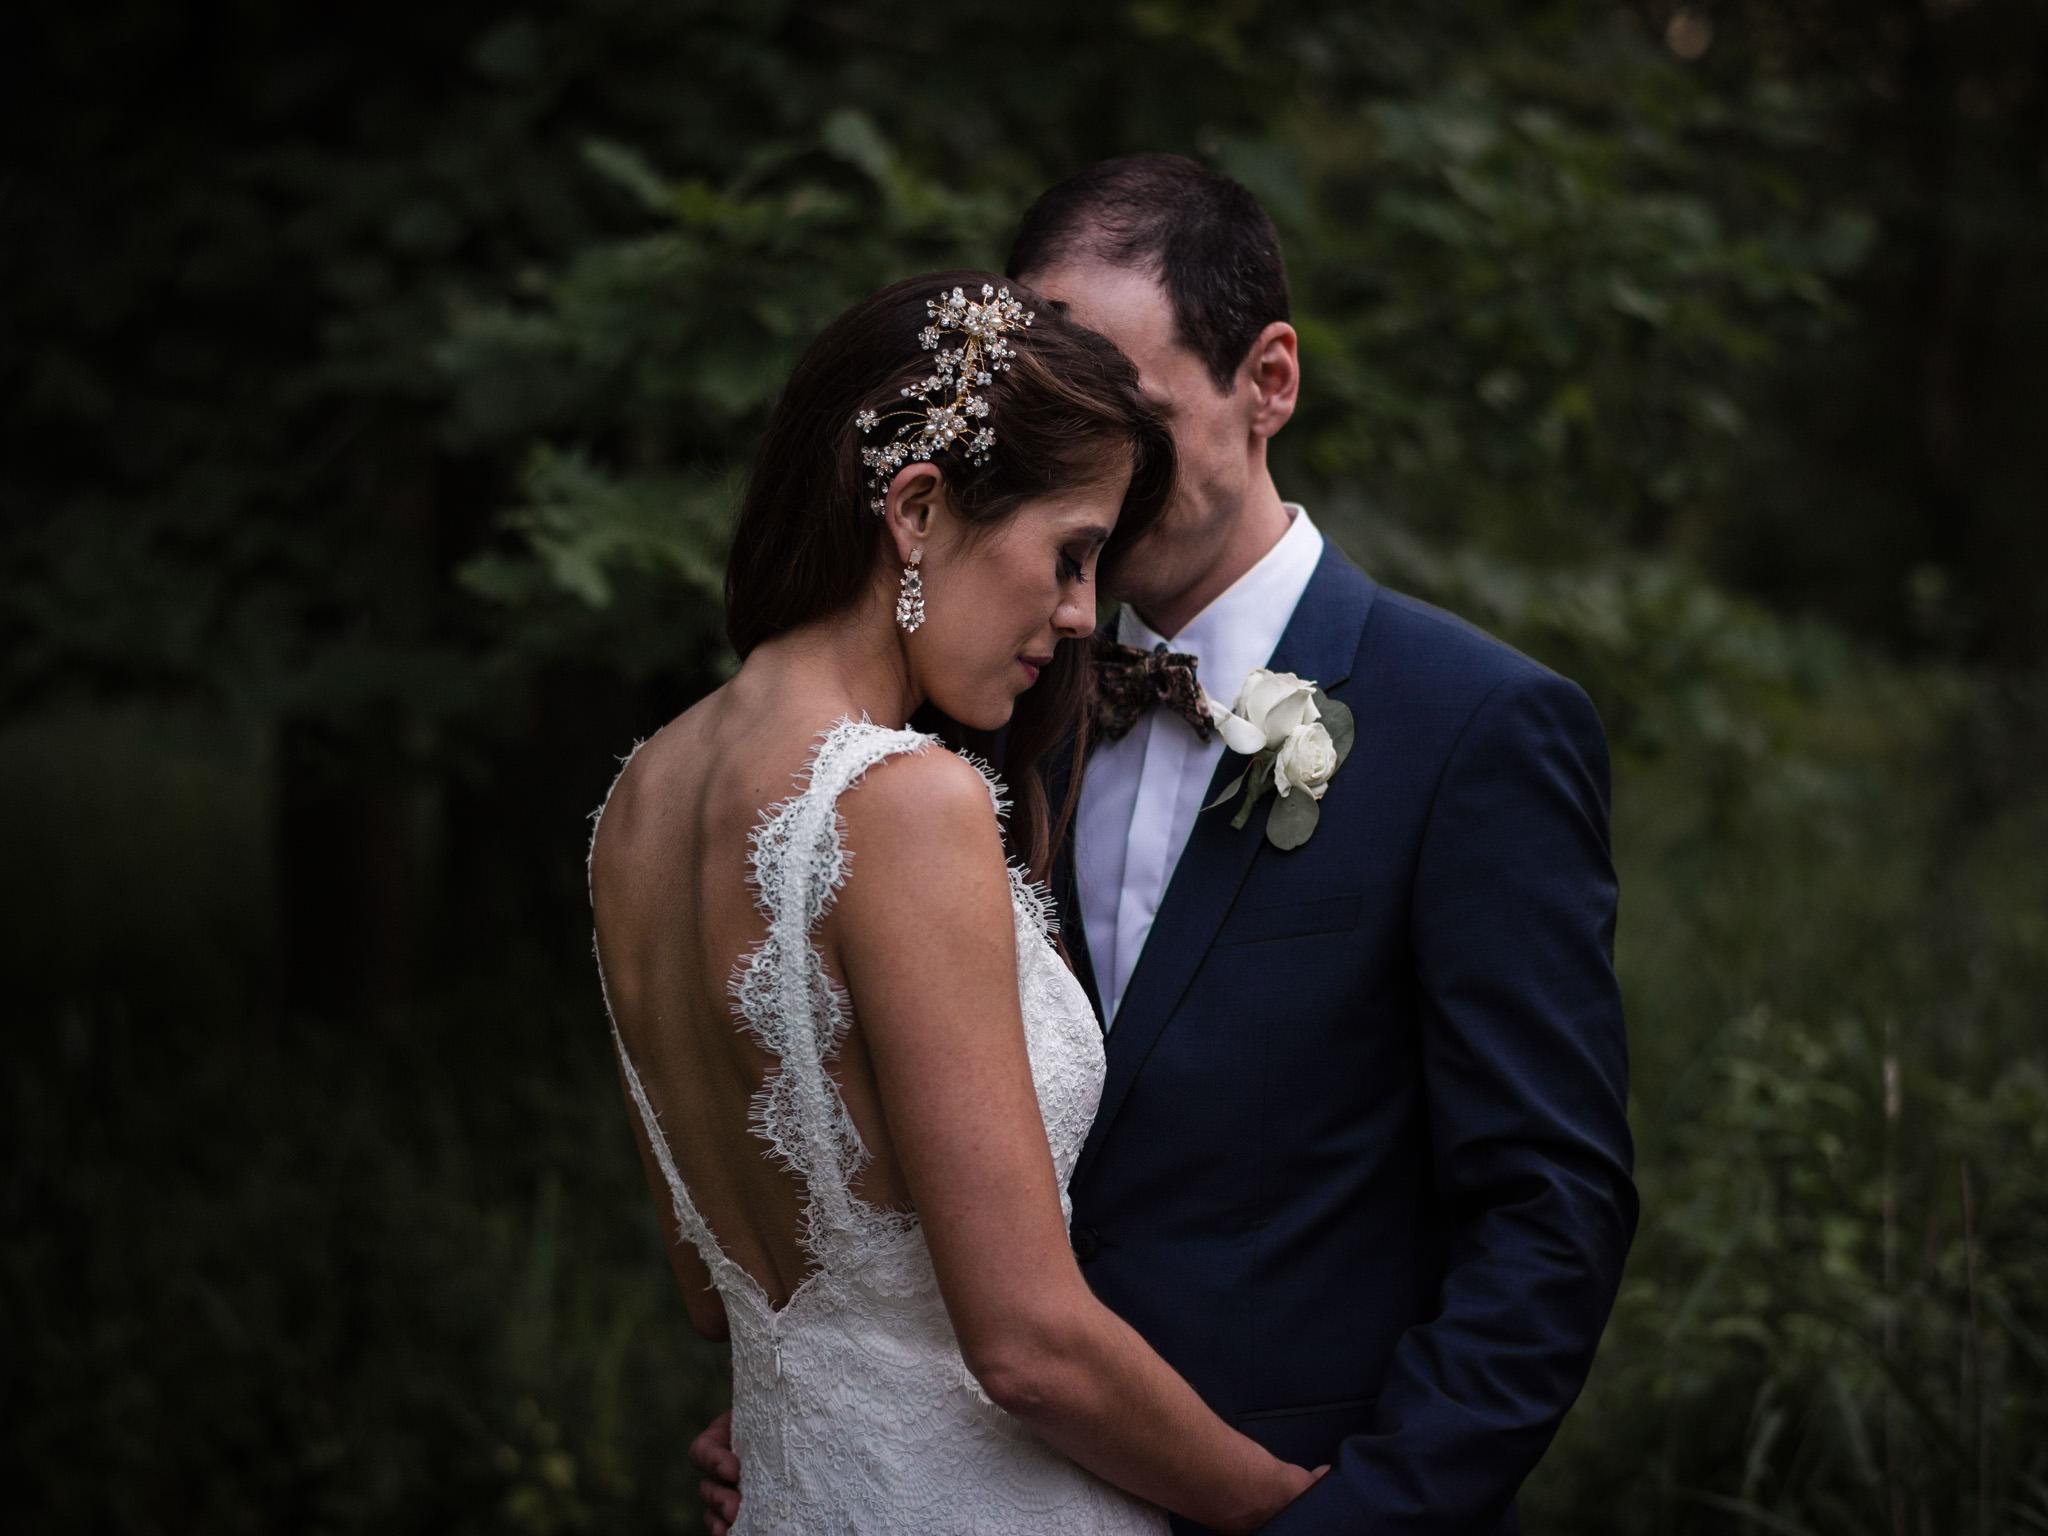 092-sydenham-ridge-wedding-bride-groom-portraits-toronto-wedding-photographer.jpg